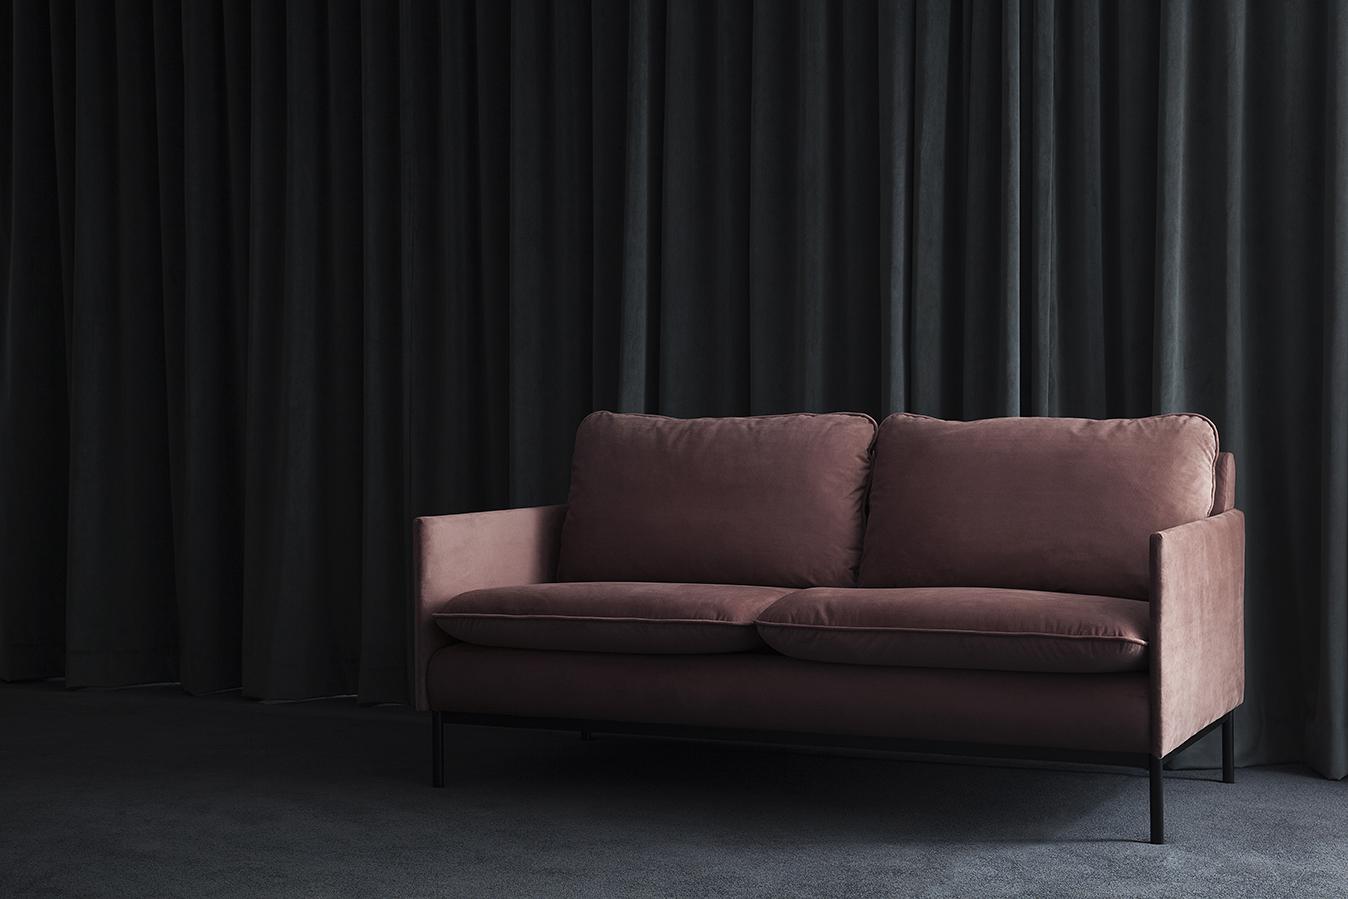 Hope+Sofa+Two+Seater.jpg